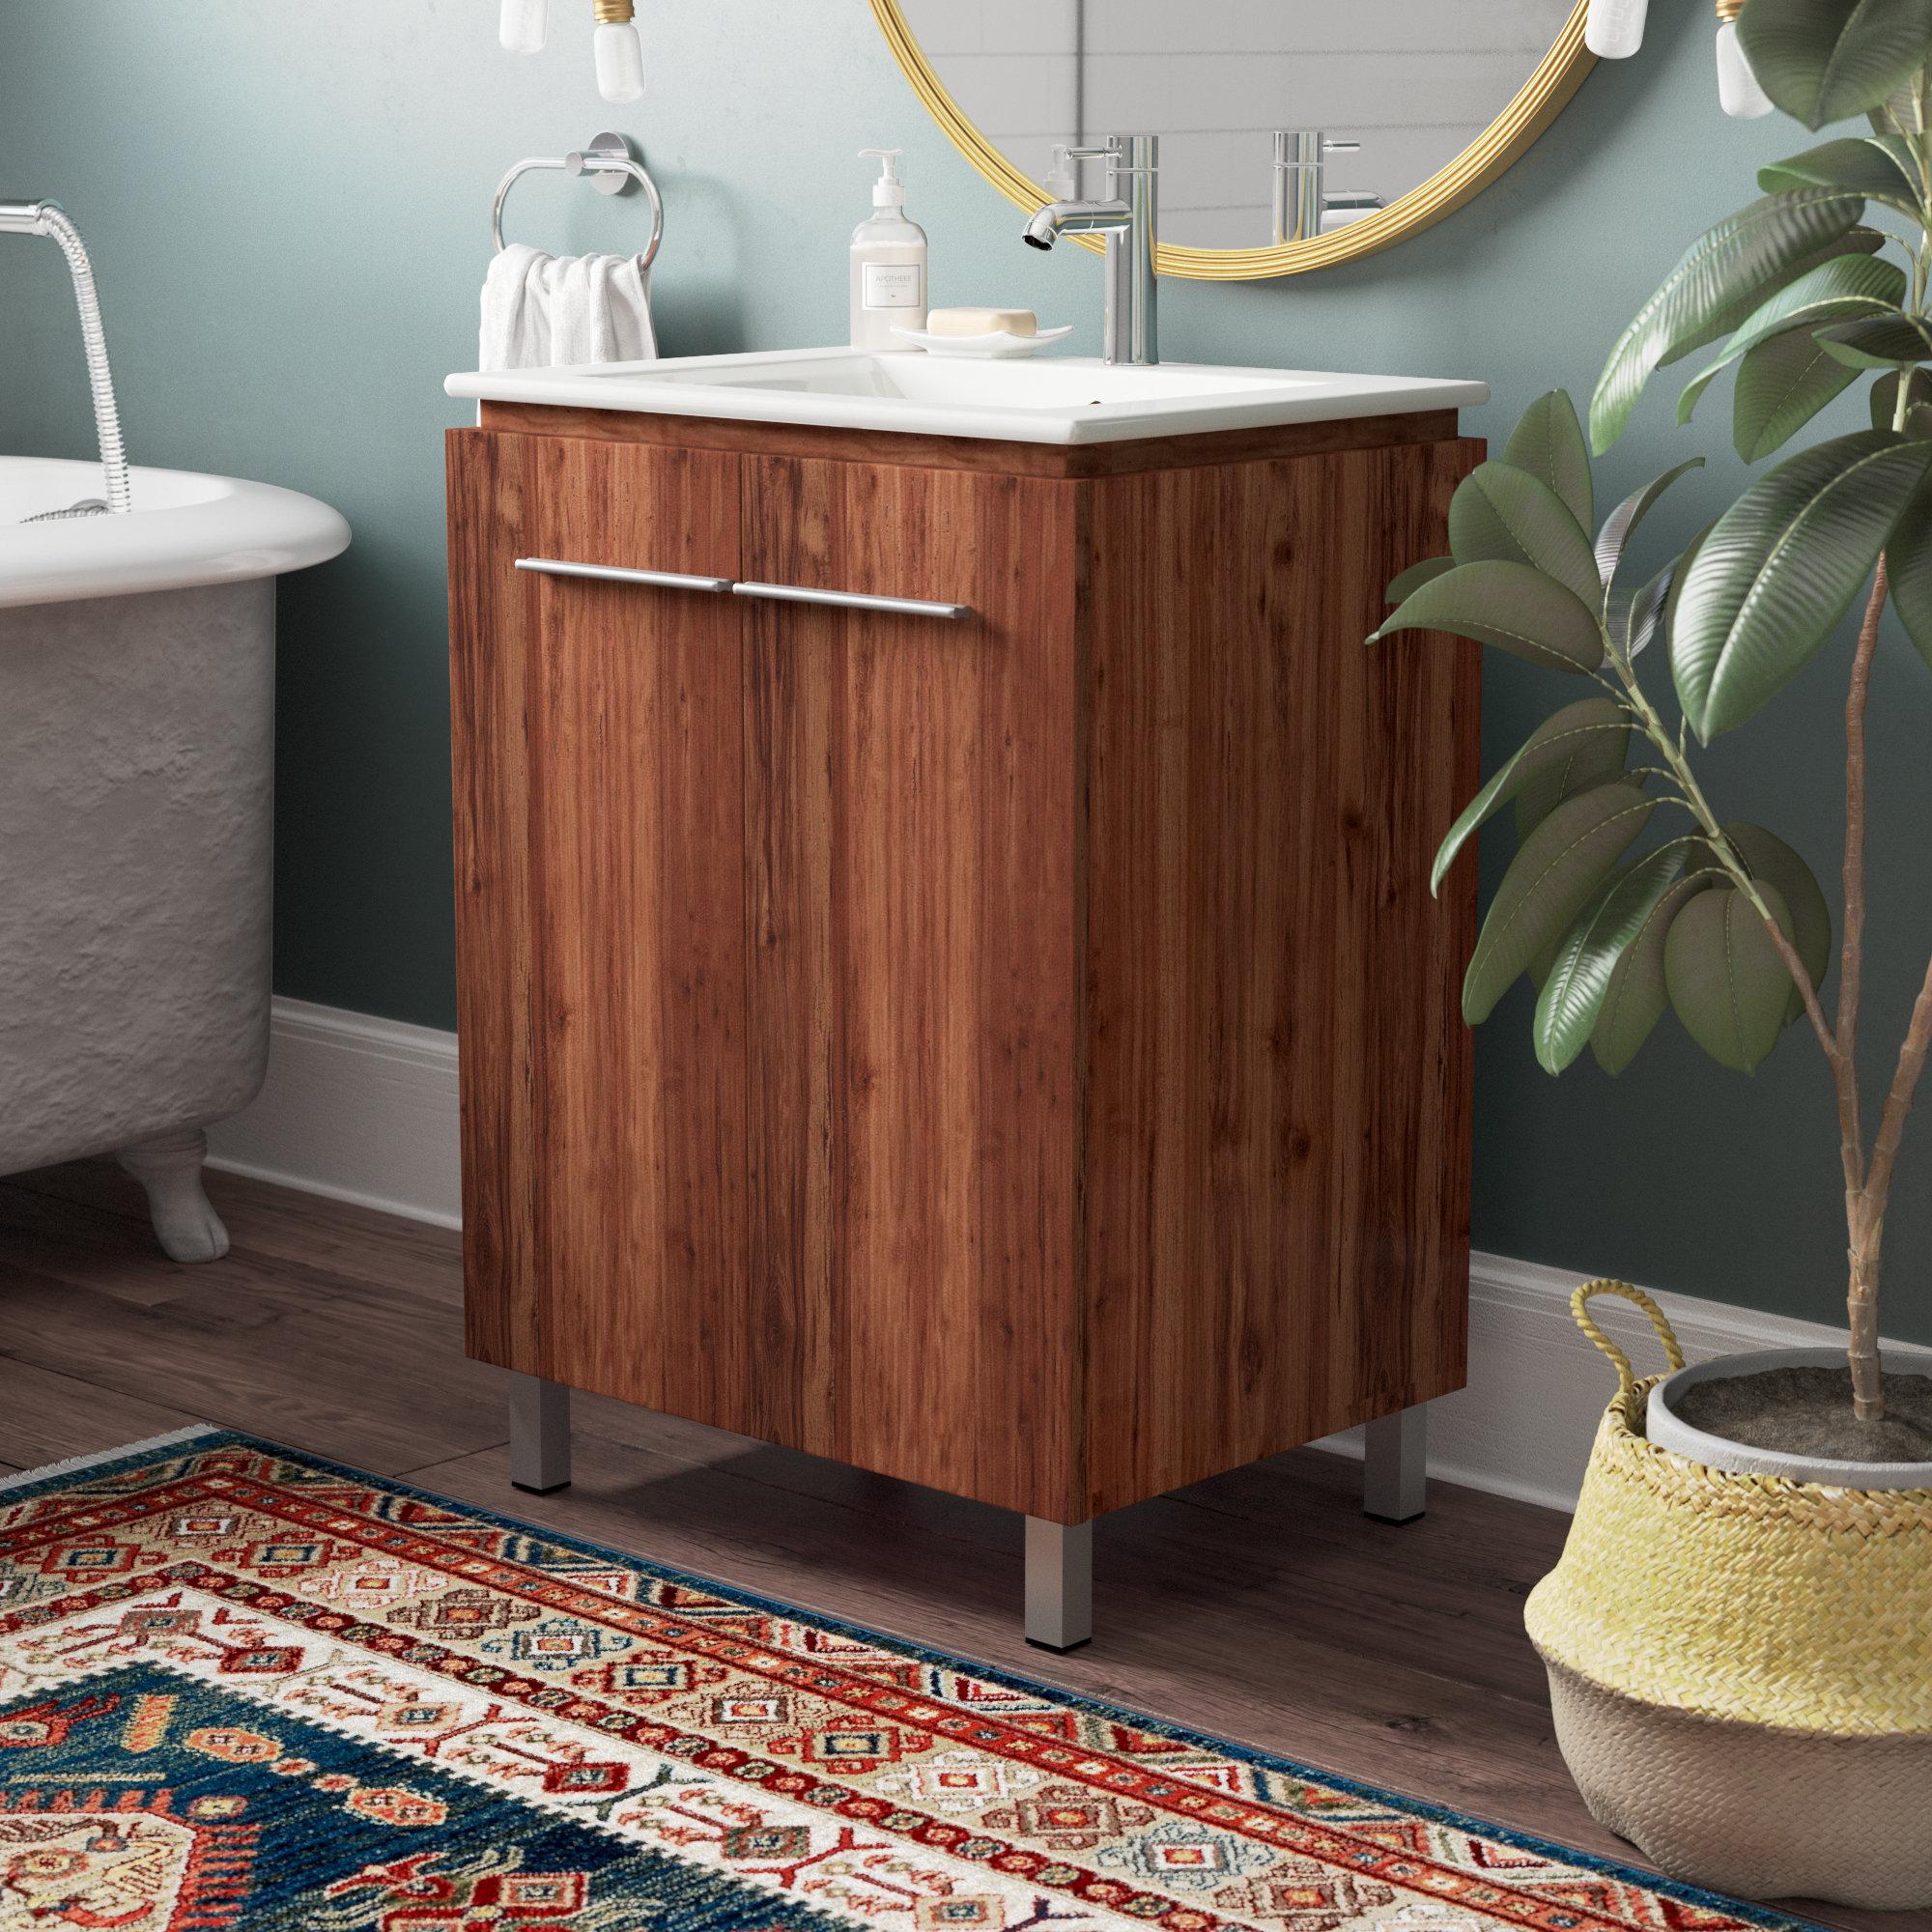 Inspiration about Modern & Contemporary Kattie 4 Door Accent Cabinet | Allmodern With Regard To Latest Kattie 4 Door Cabinets (#16 of 20)